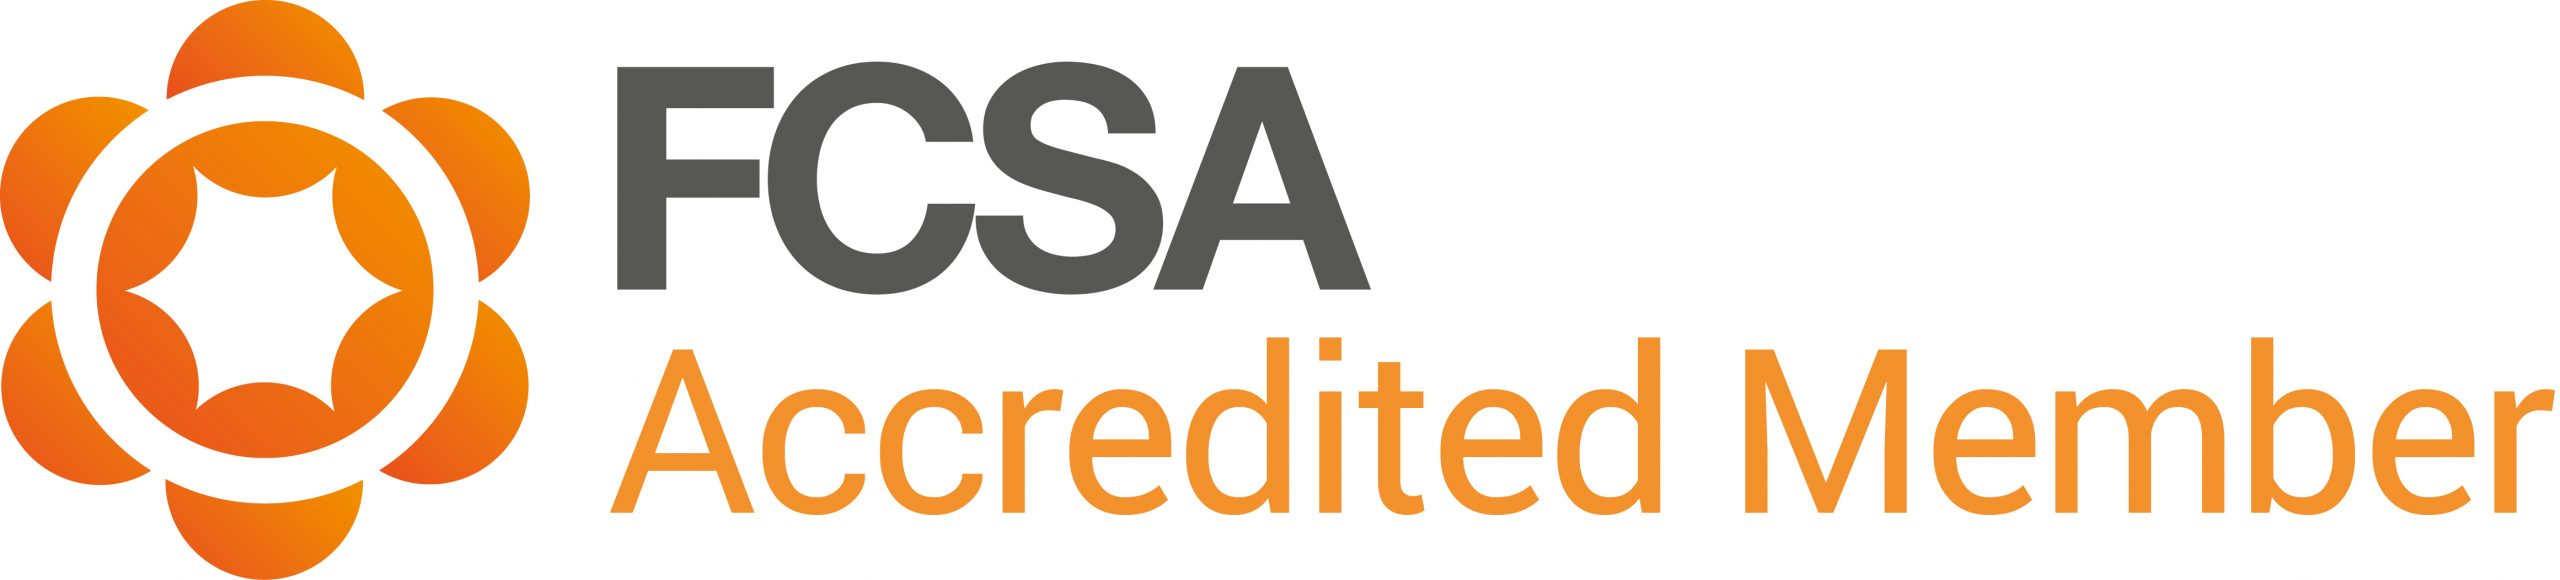 FCSA Accredited Member